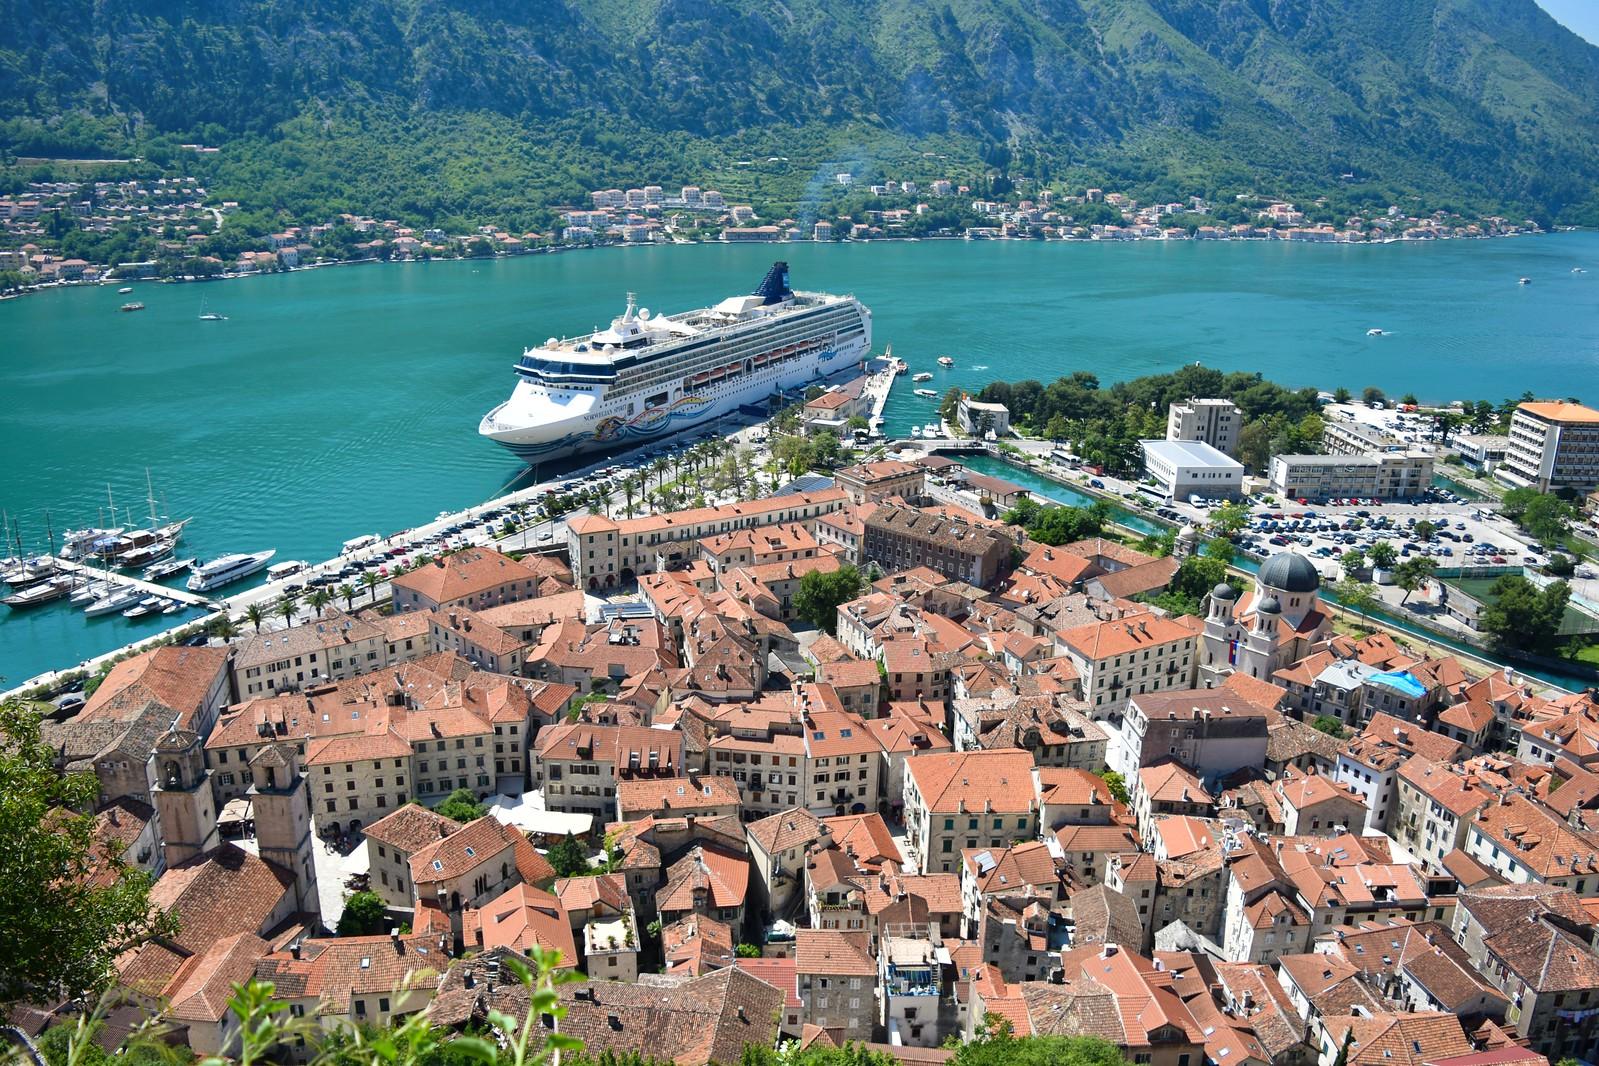 Kotor medieval town from above + Norwegian Spirit cruise